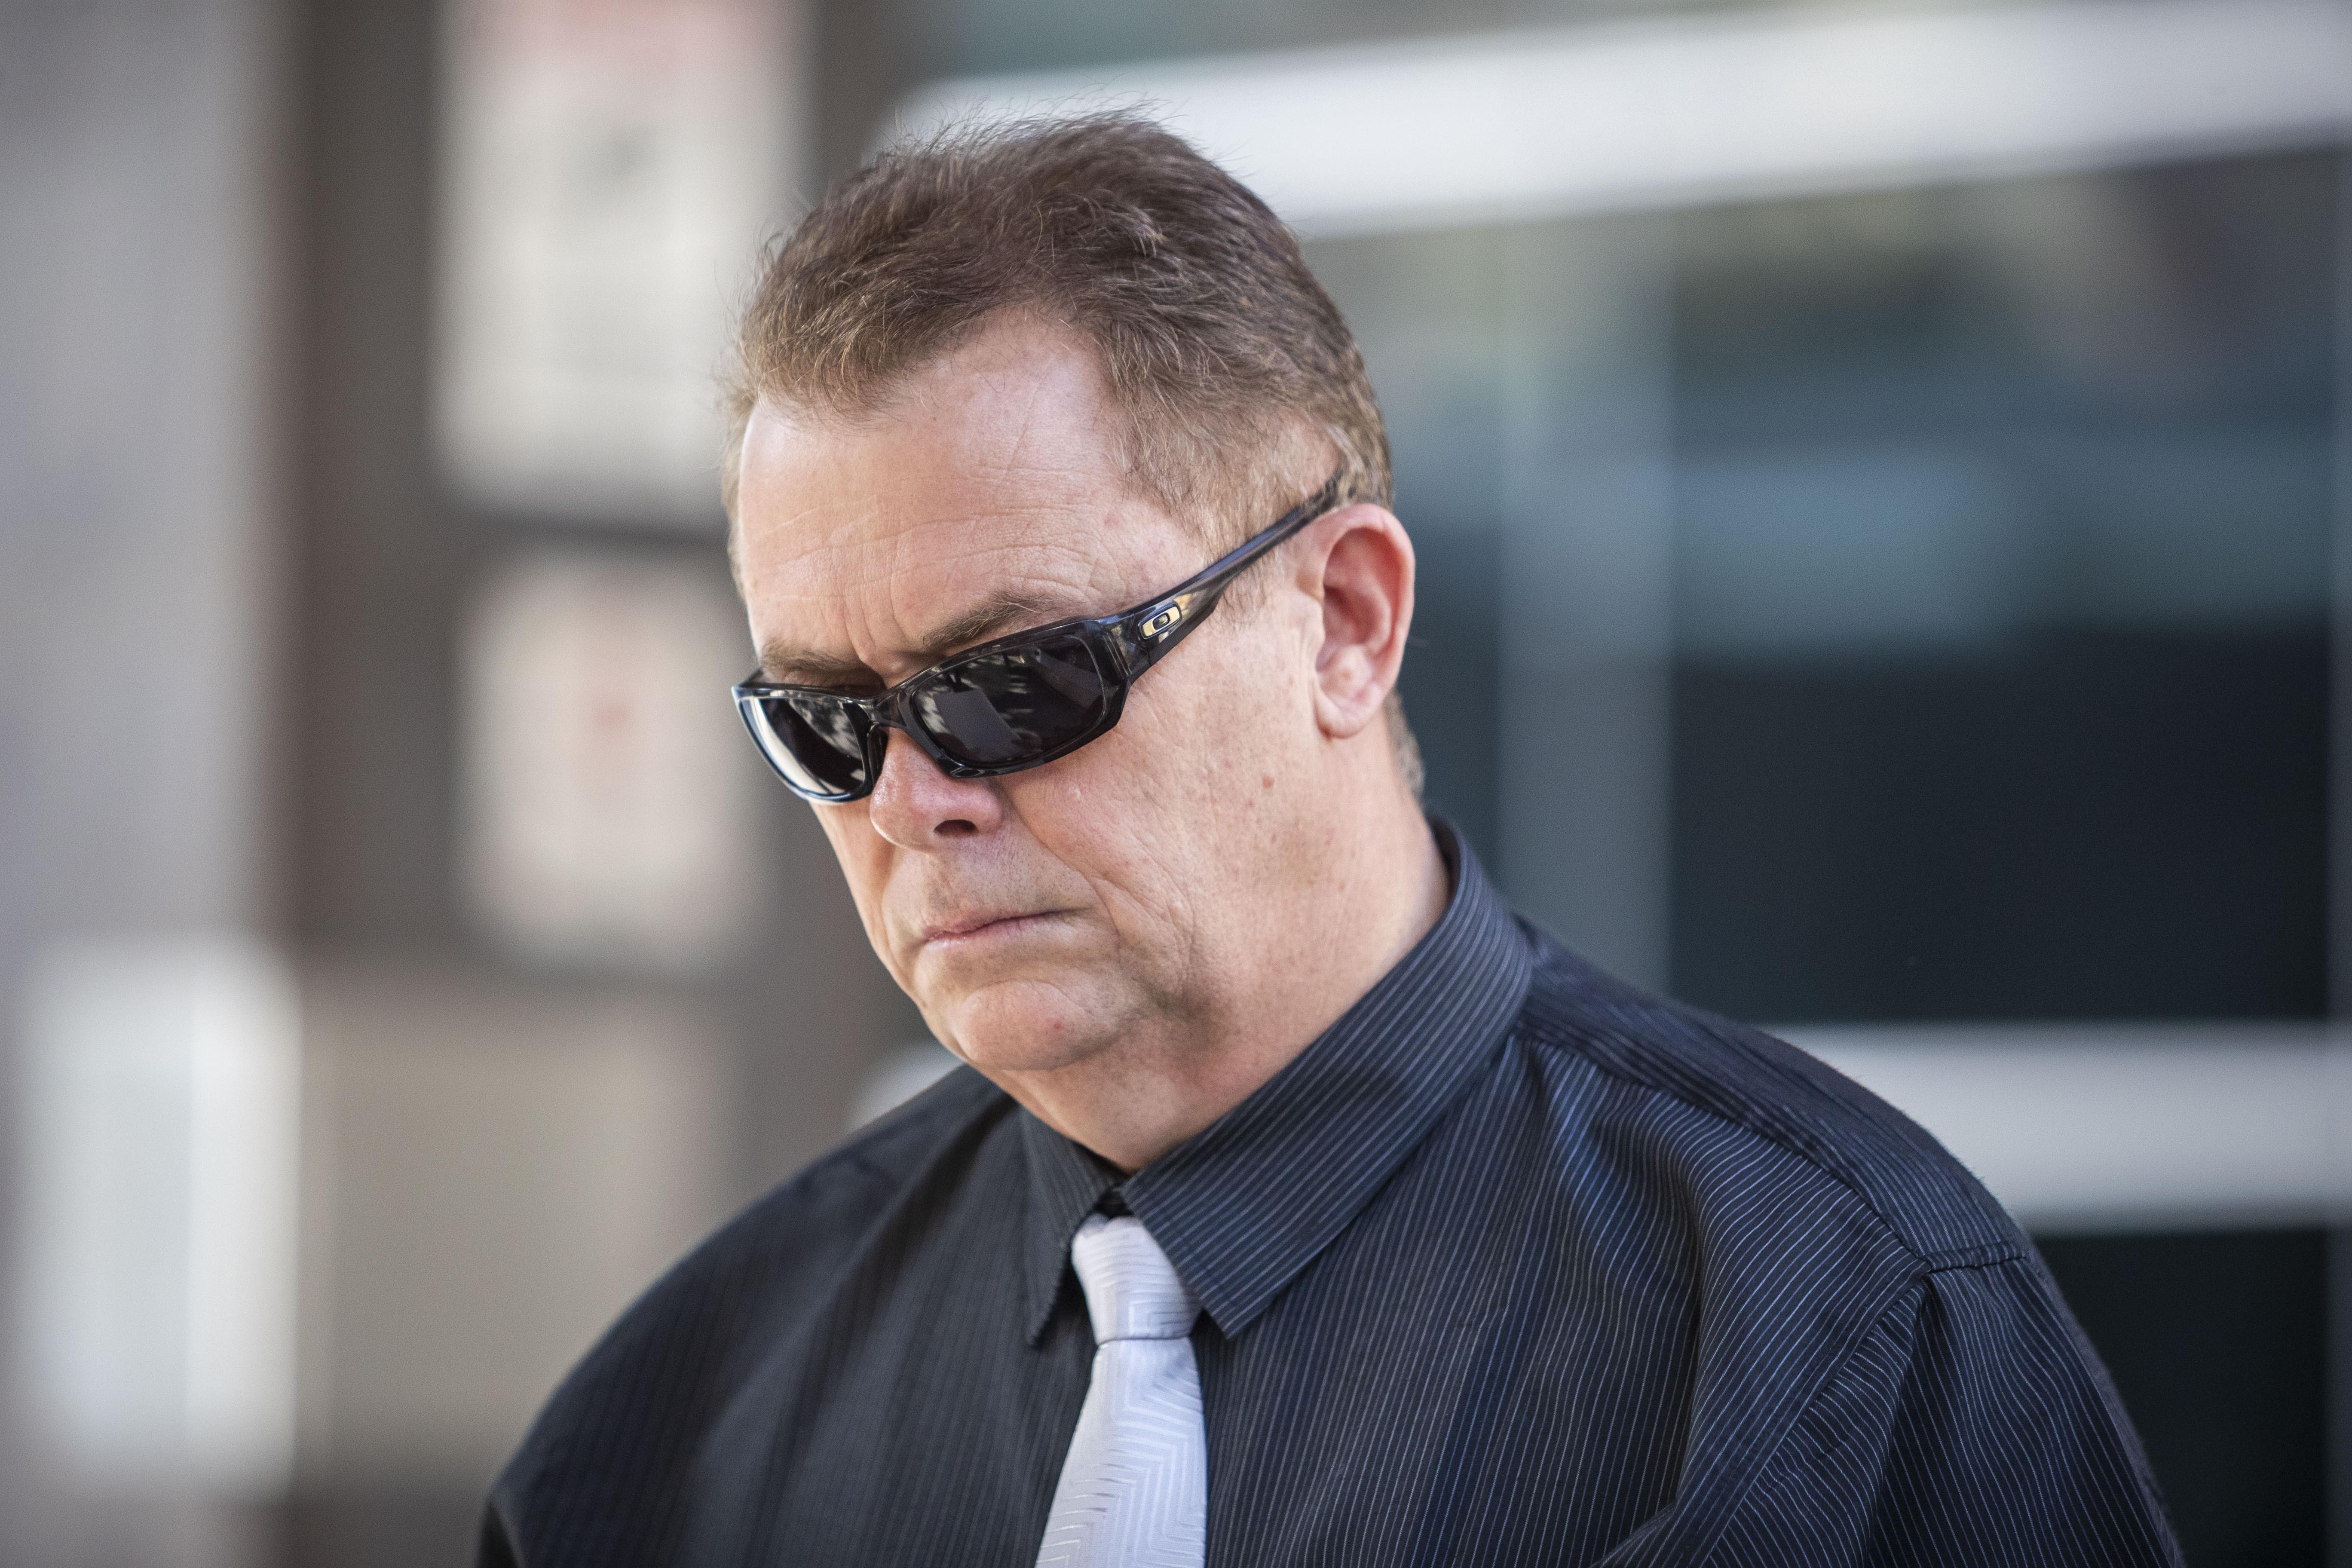 Queensland Police Senior Constable Neil Punchard.